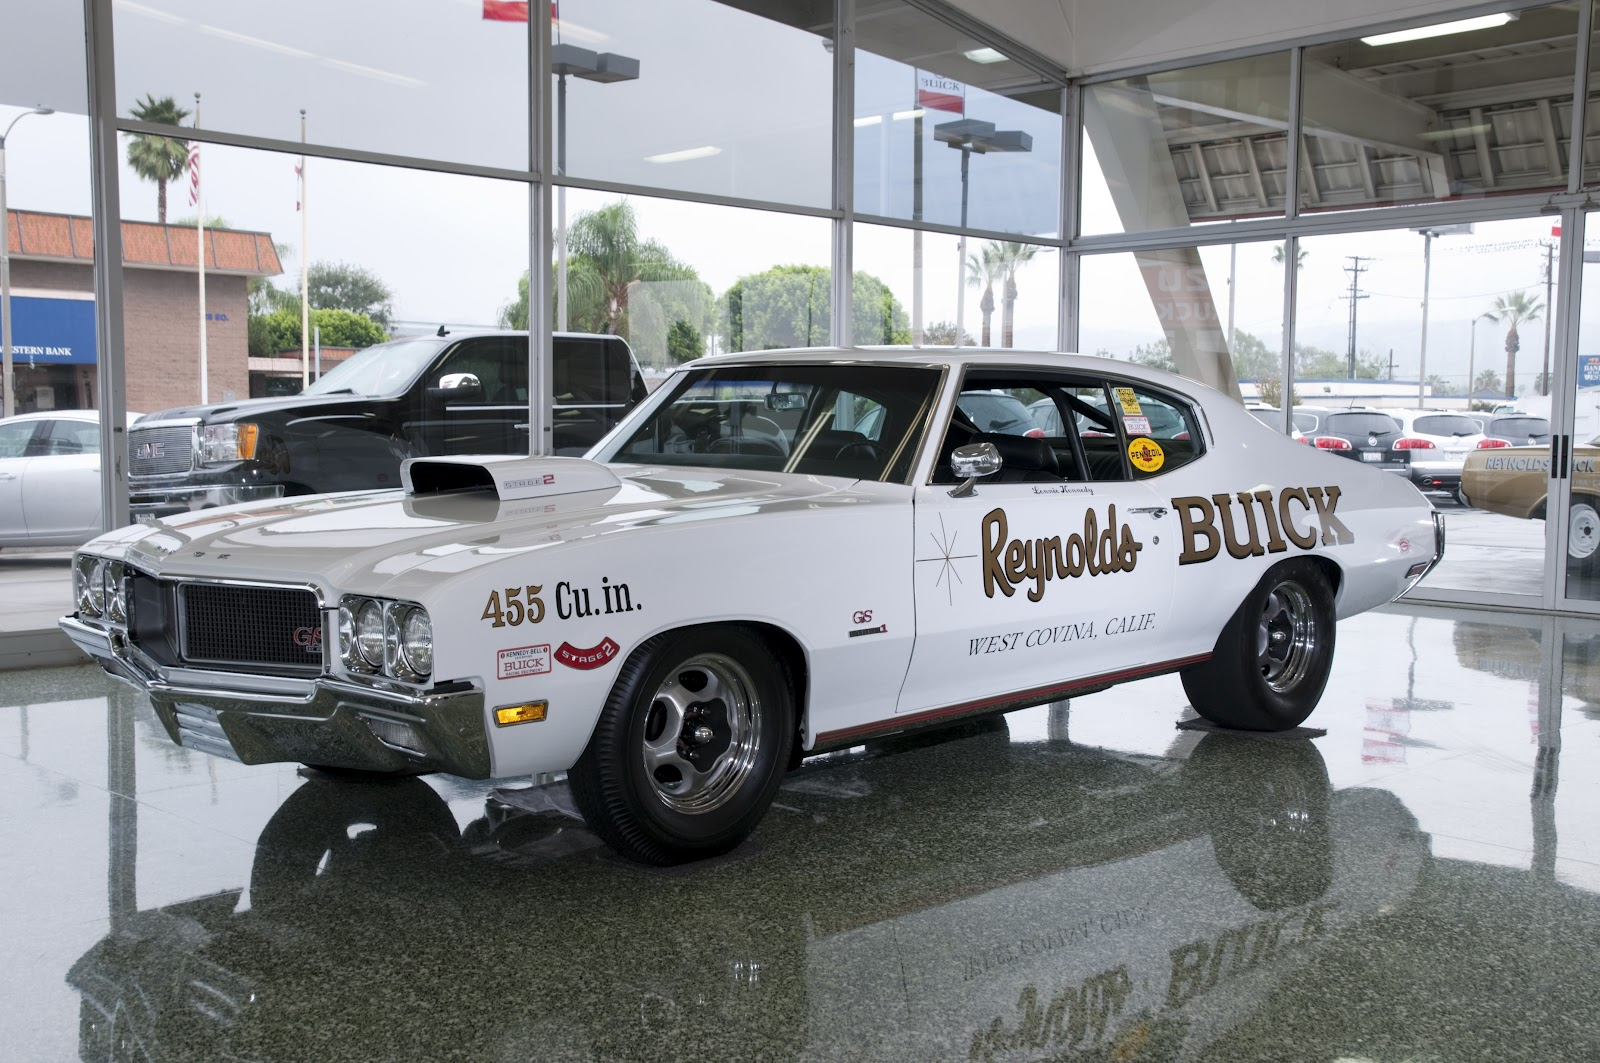 reynolds buick gmc blog: reynolds buick hosts their 95th hi